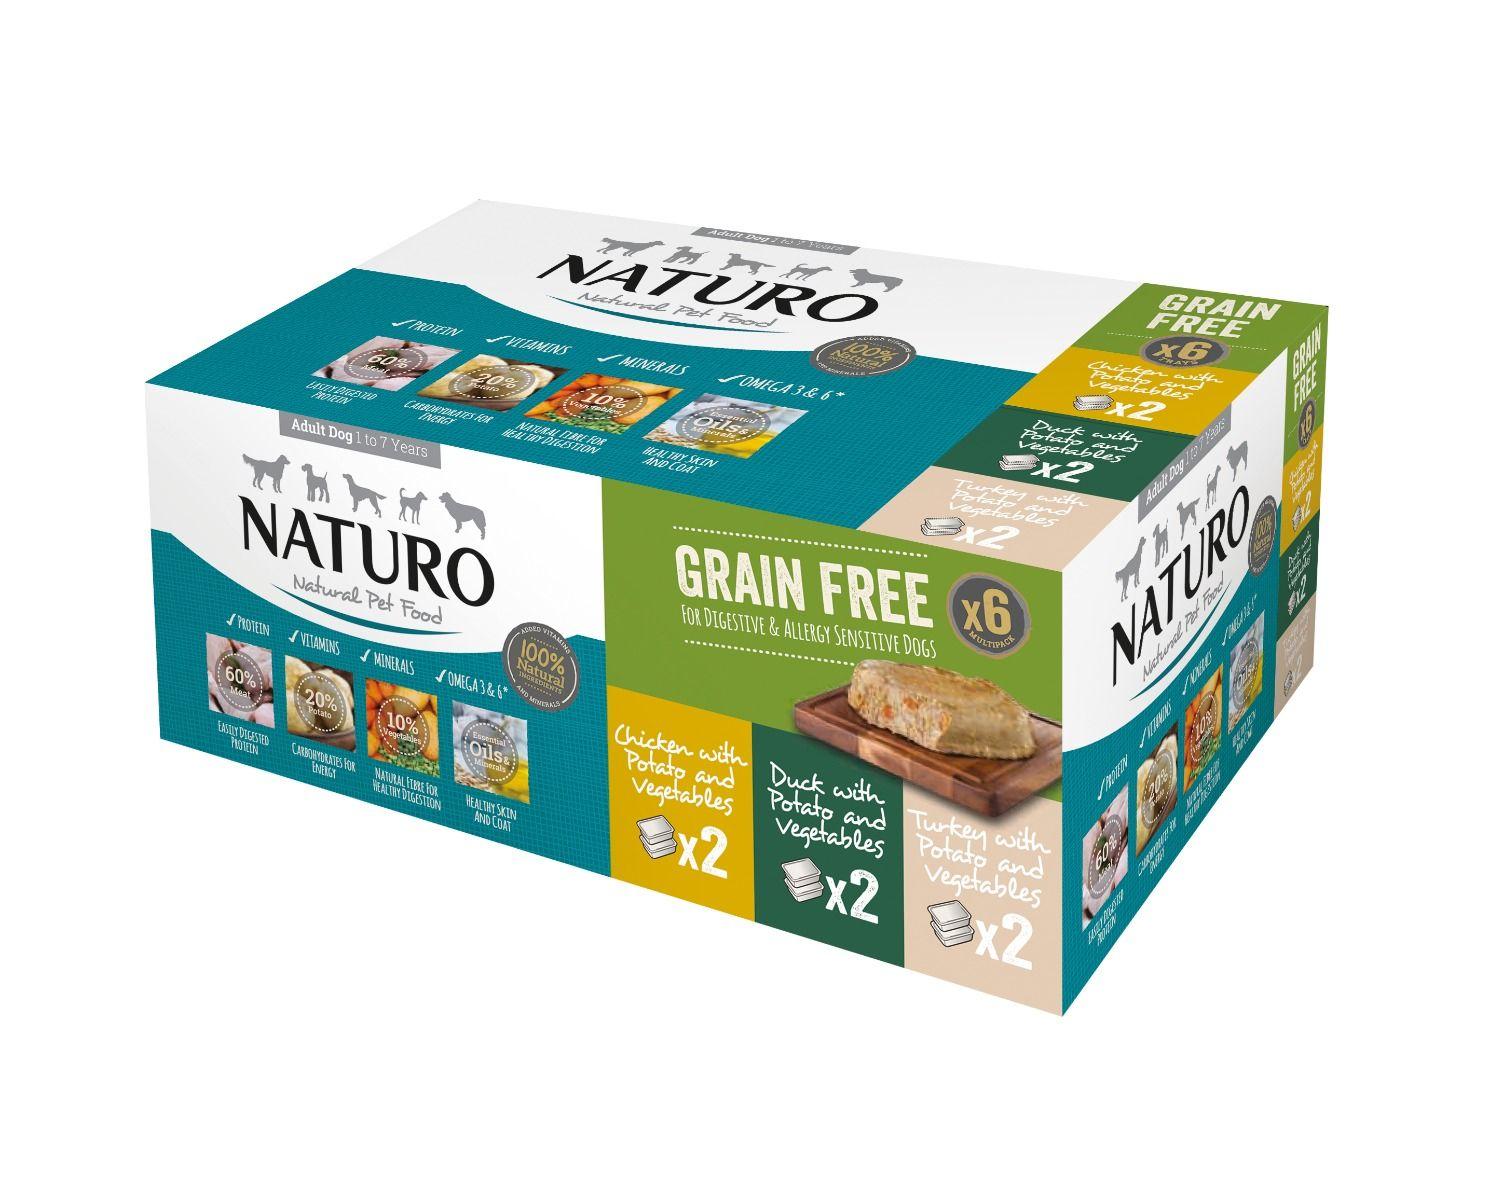 Naturo Adult Dog Grain Free pack Variety Trays, 400-g, 6-pack